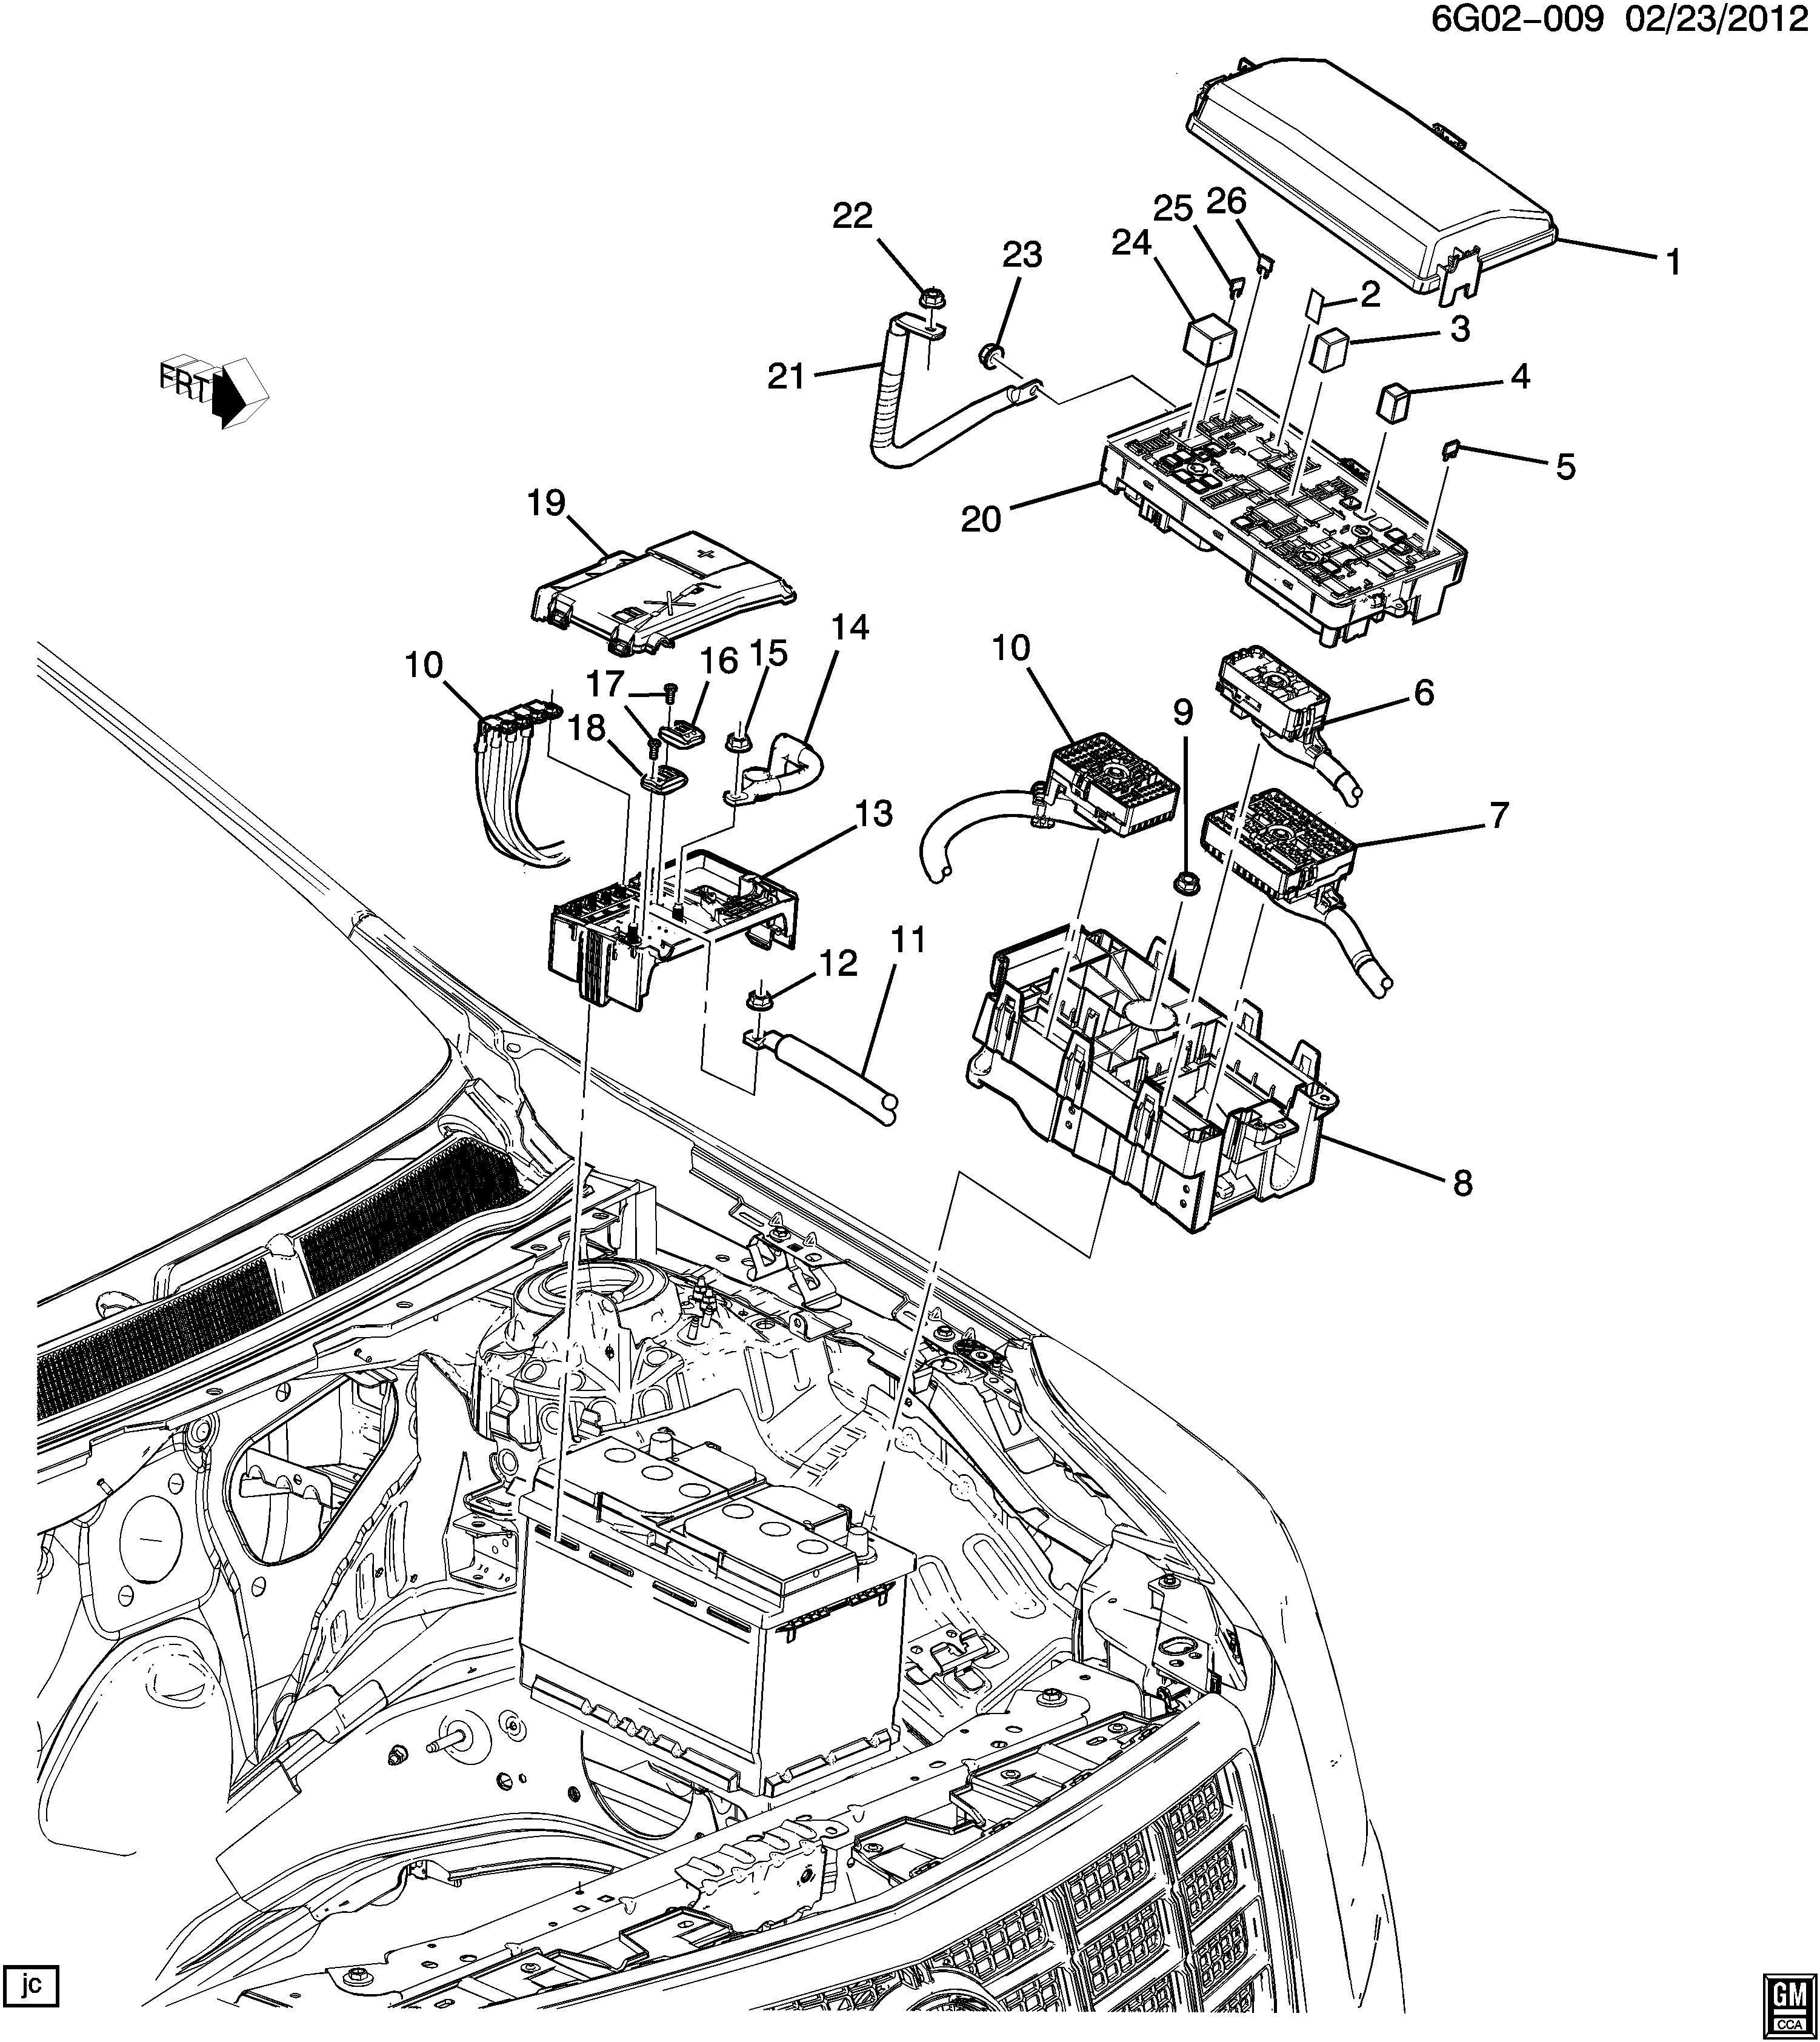 Buick LaCrosse Fuse. Fuse. Fuse, f/cmpt fuse blk(300 amp